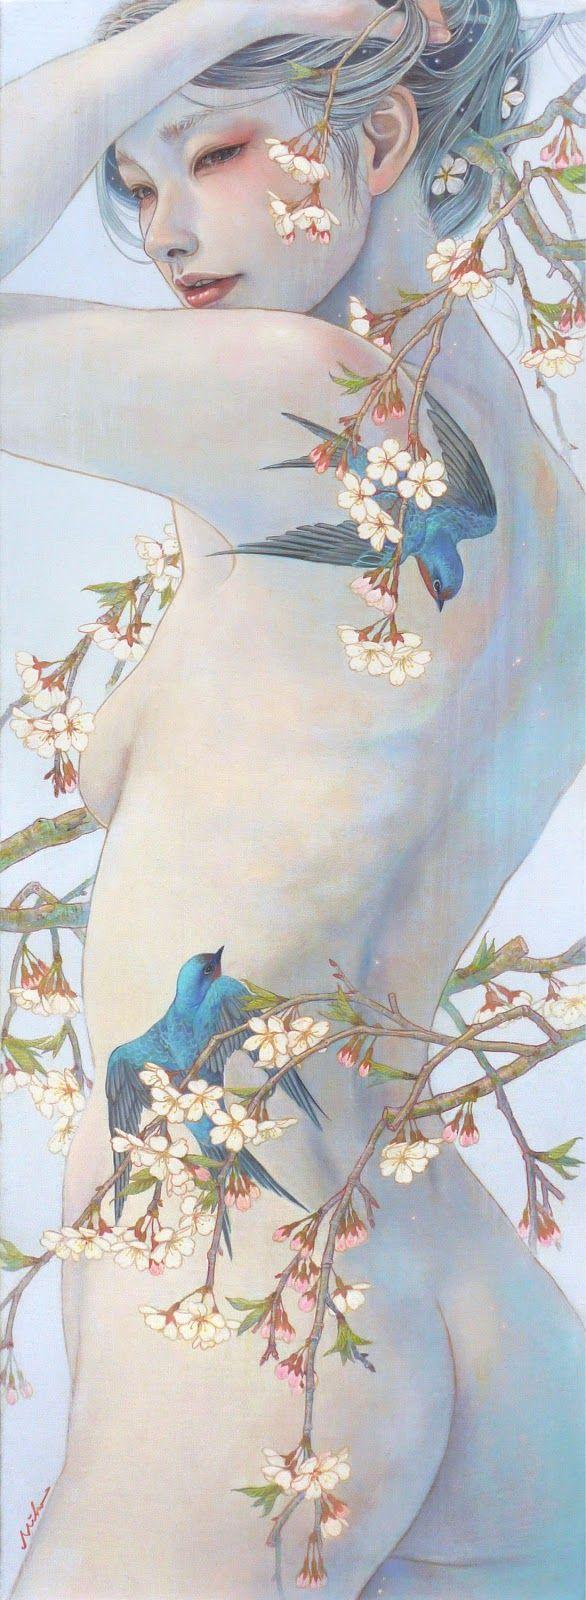 Miho Hirano / 平野 実 穂 | Arte pop de la fantasía | Tutt'Art @ | Pittura * Scultura * * Poesia Musica |